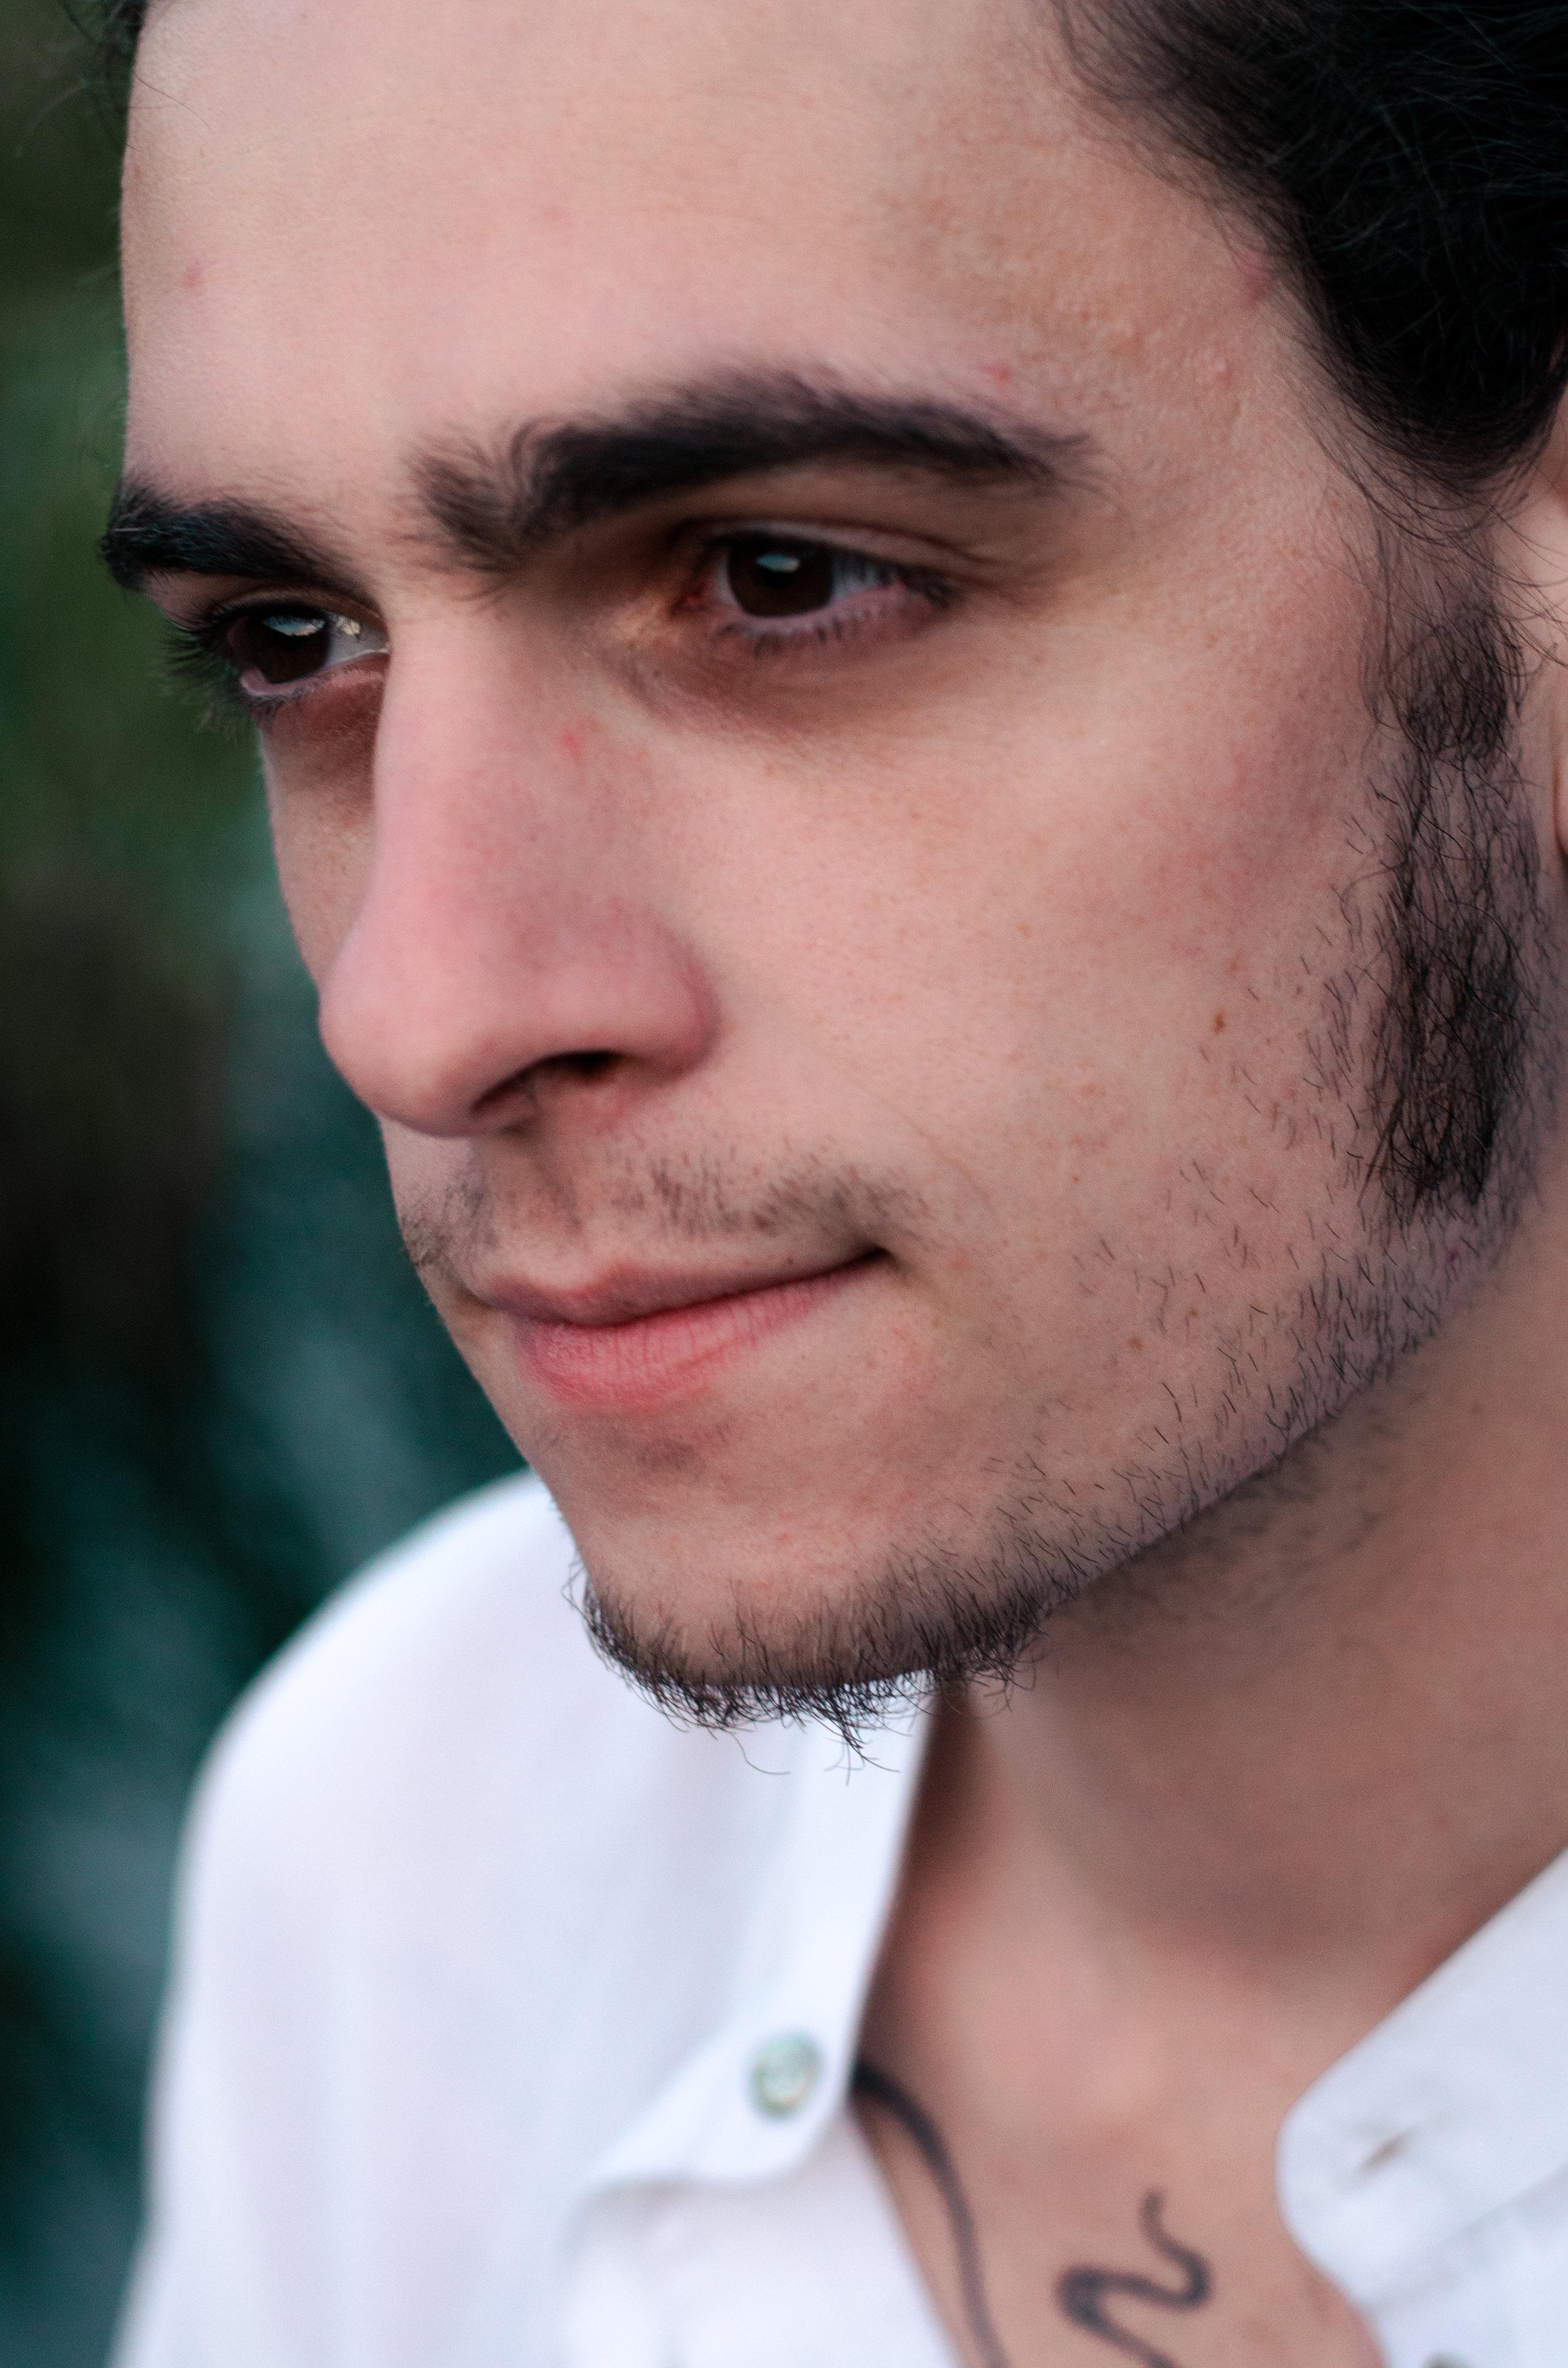 John-Portrait-Photoshoot-Aiste-Saulyte-Photography-181.jpg